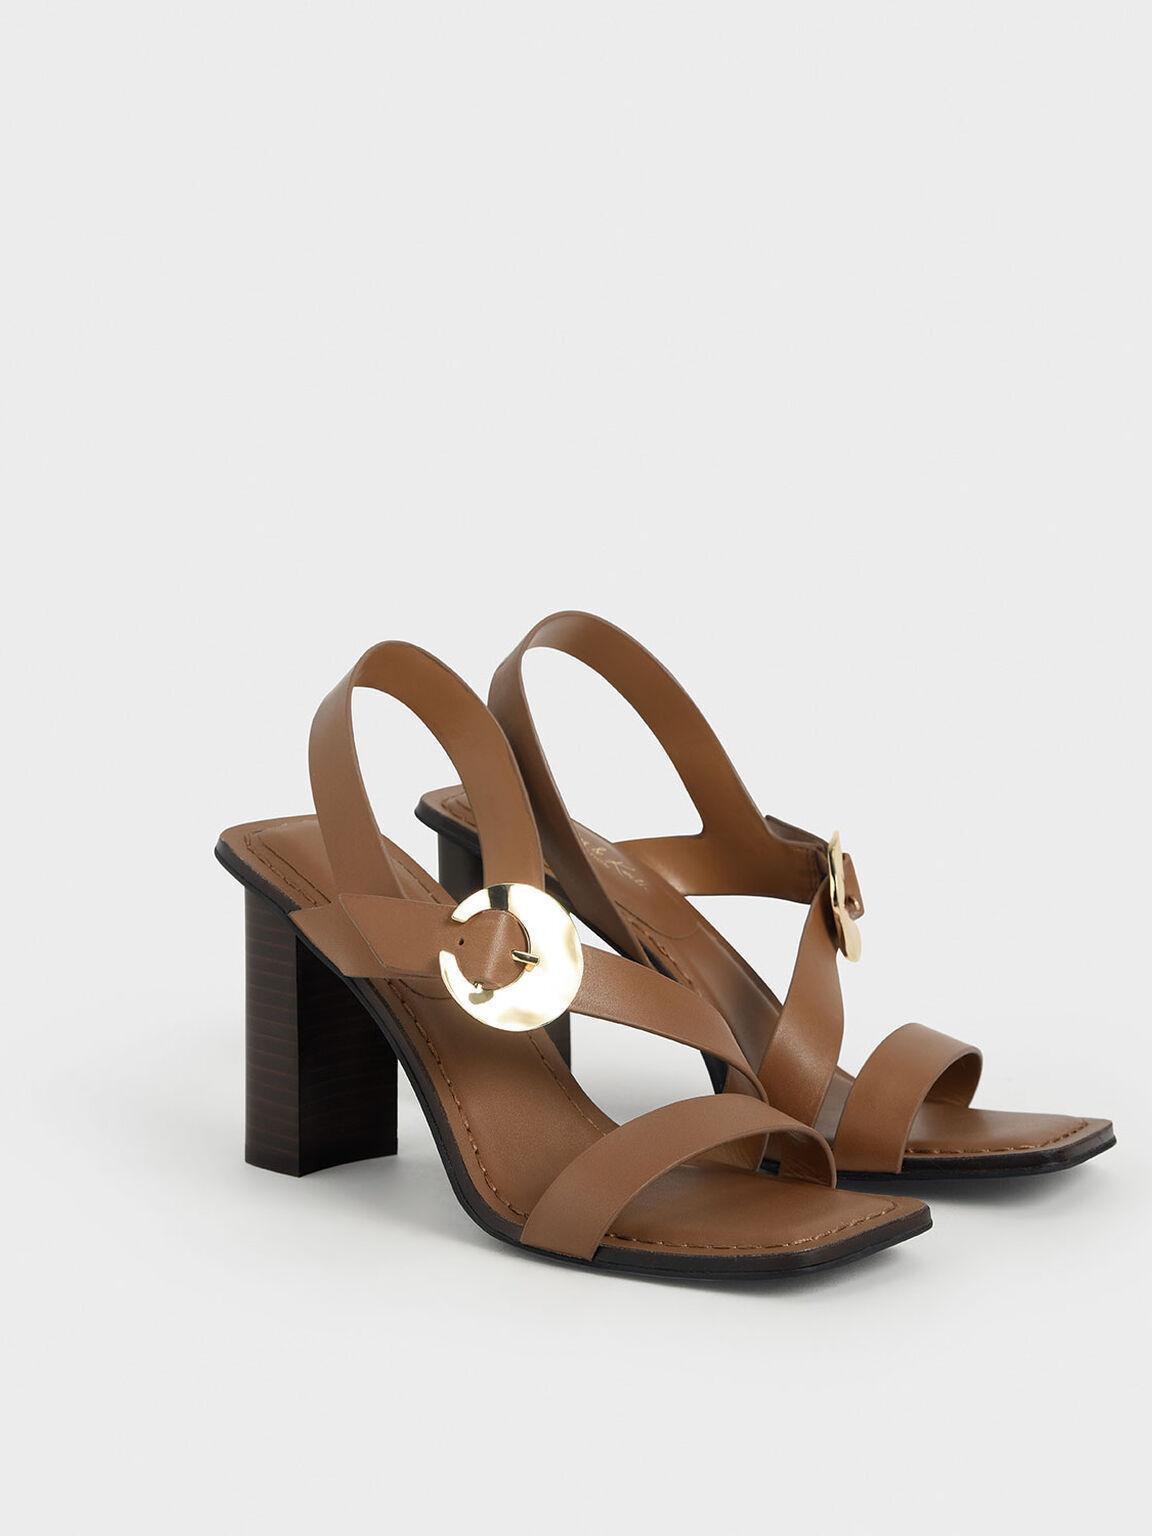 Leather Hammered Buckle Heeled Sandals, Brown, hi-res